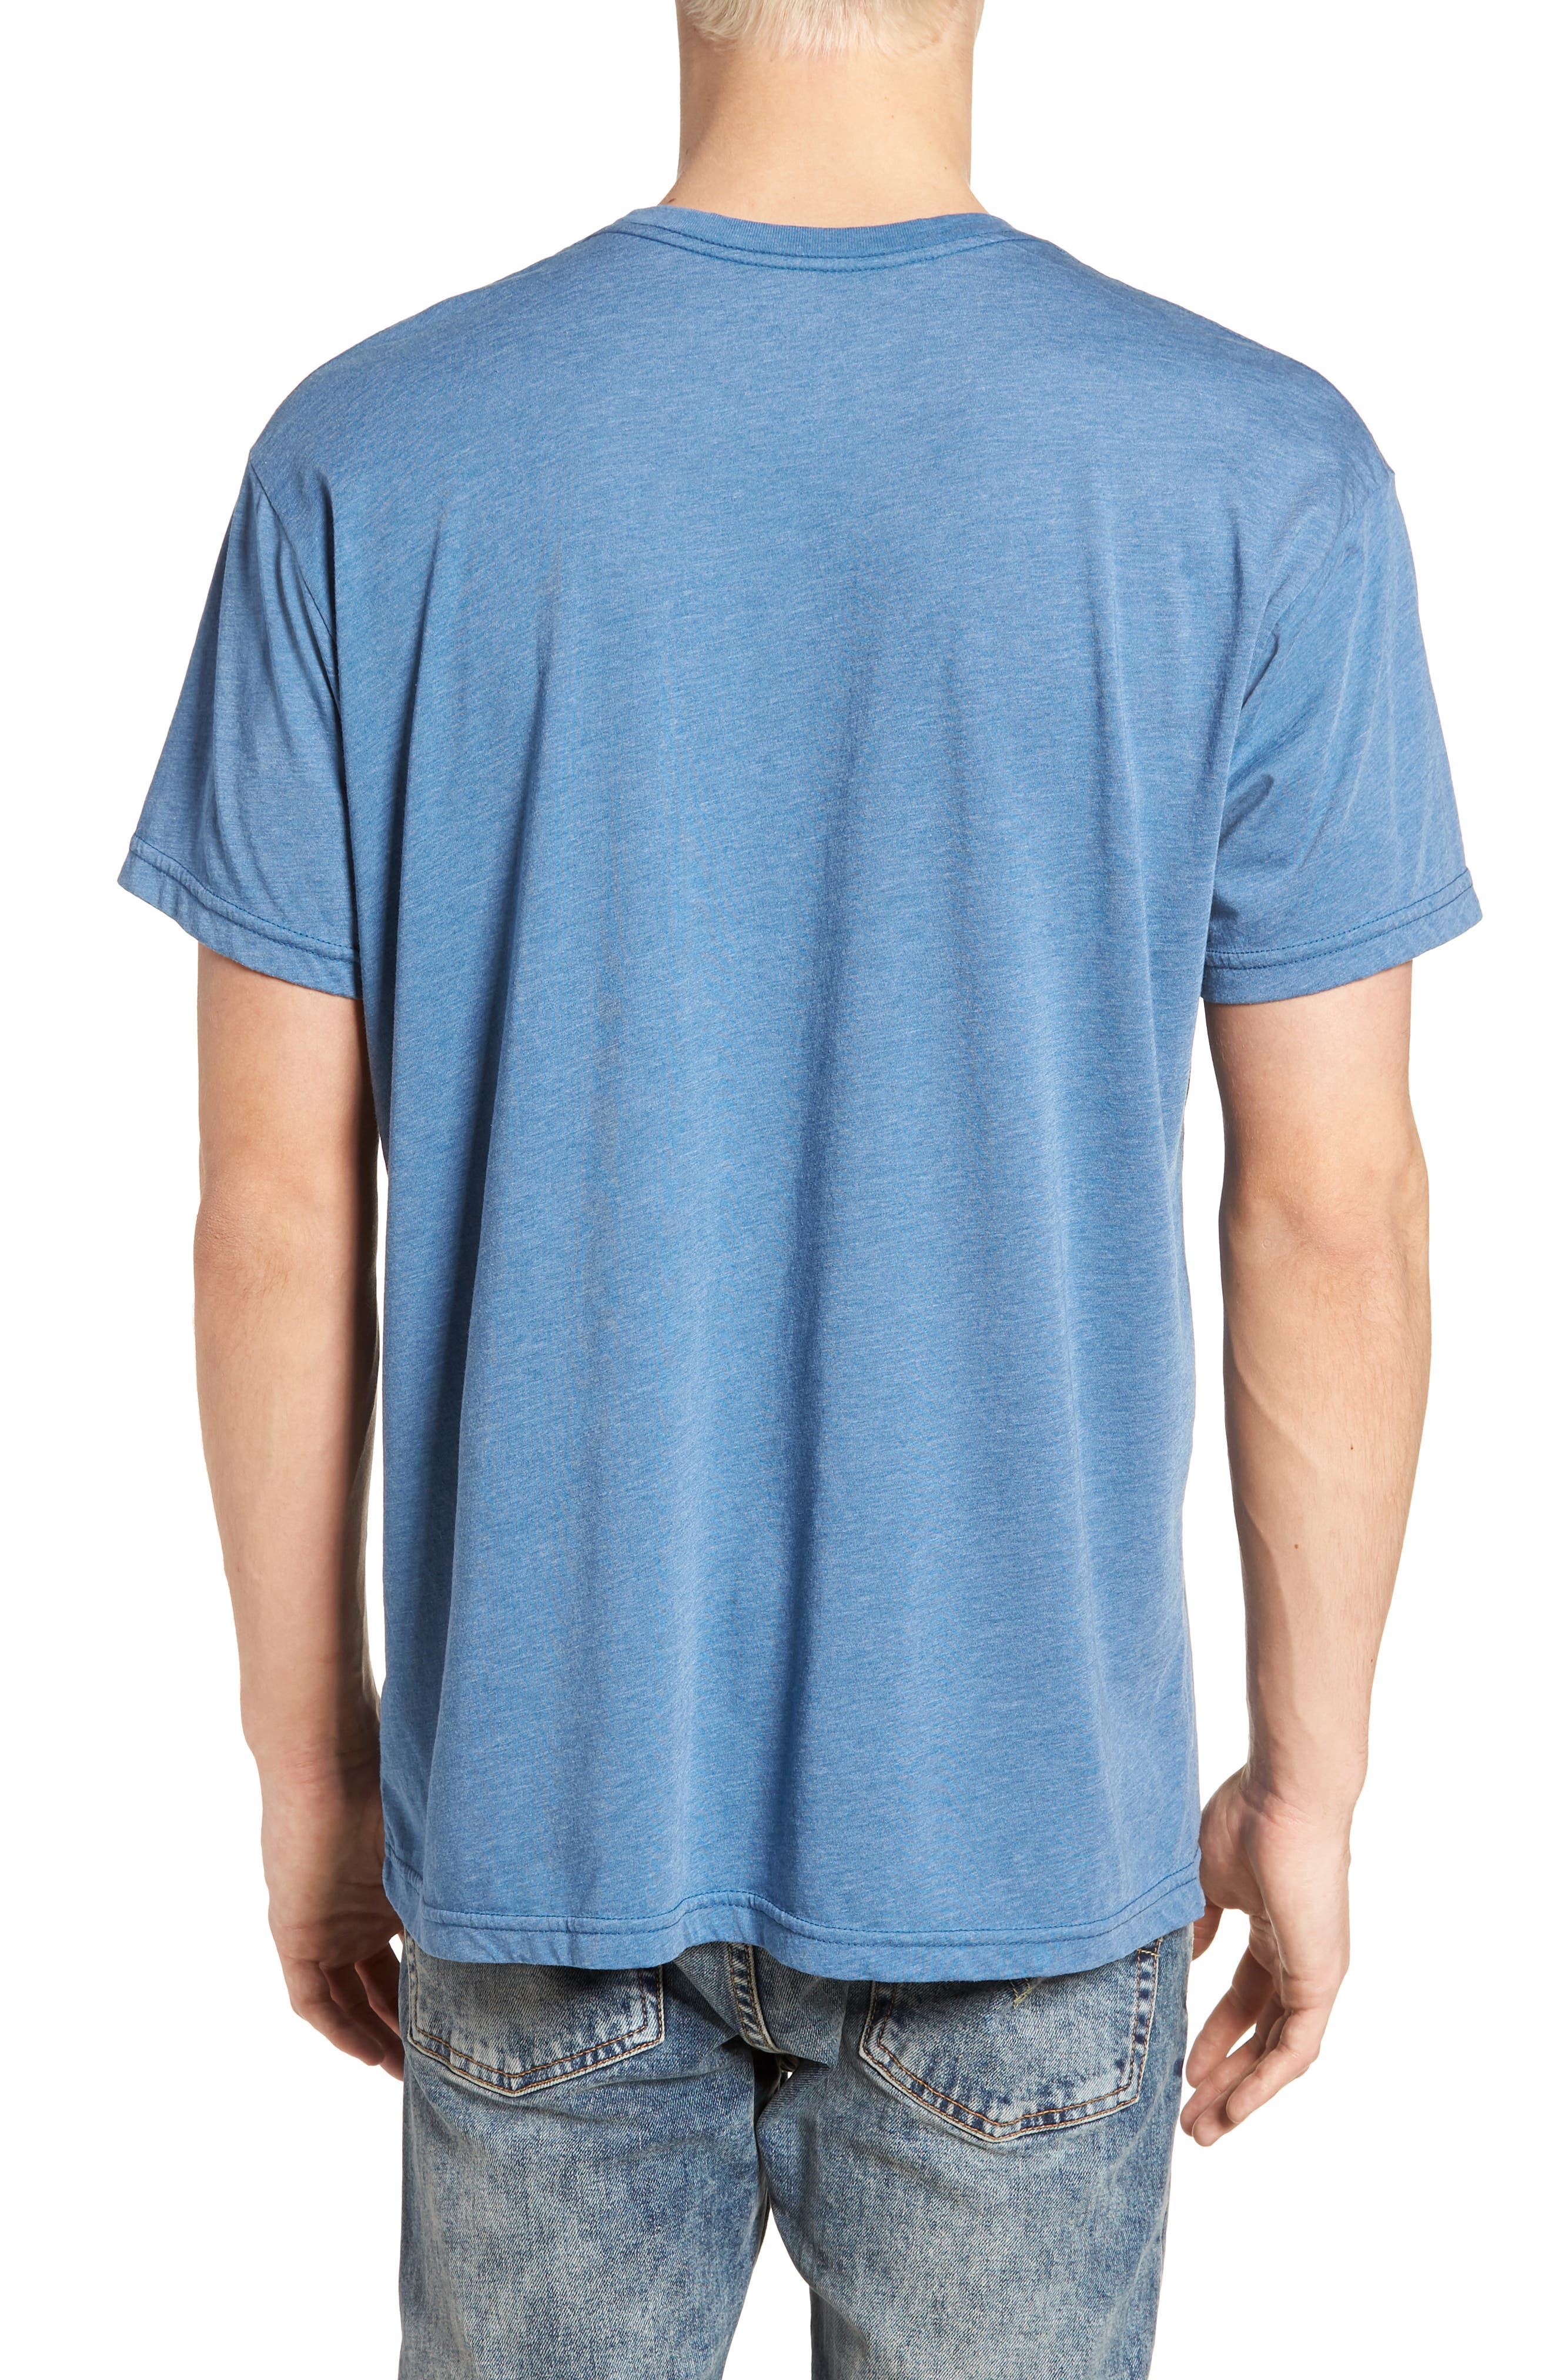 Devo Graphic T-Shirt,                             Alternate thumbnail 2, color,                             Heather Blue